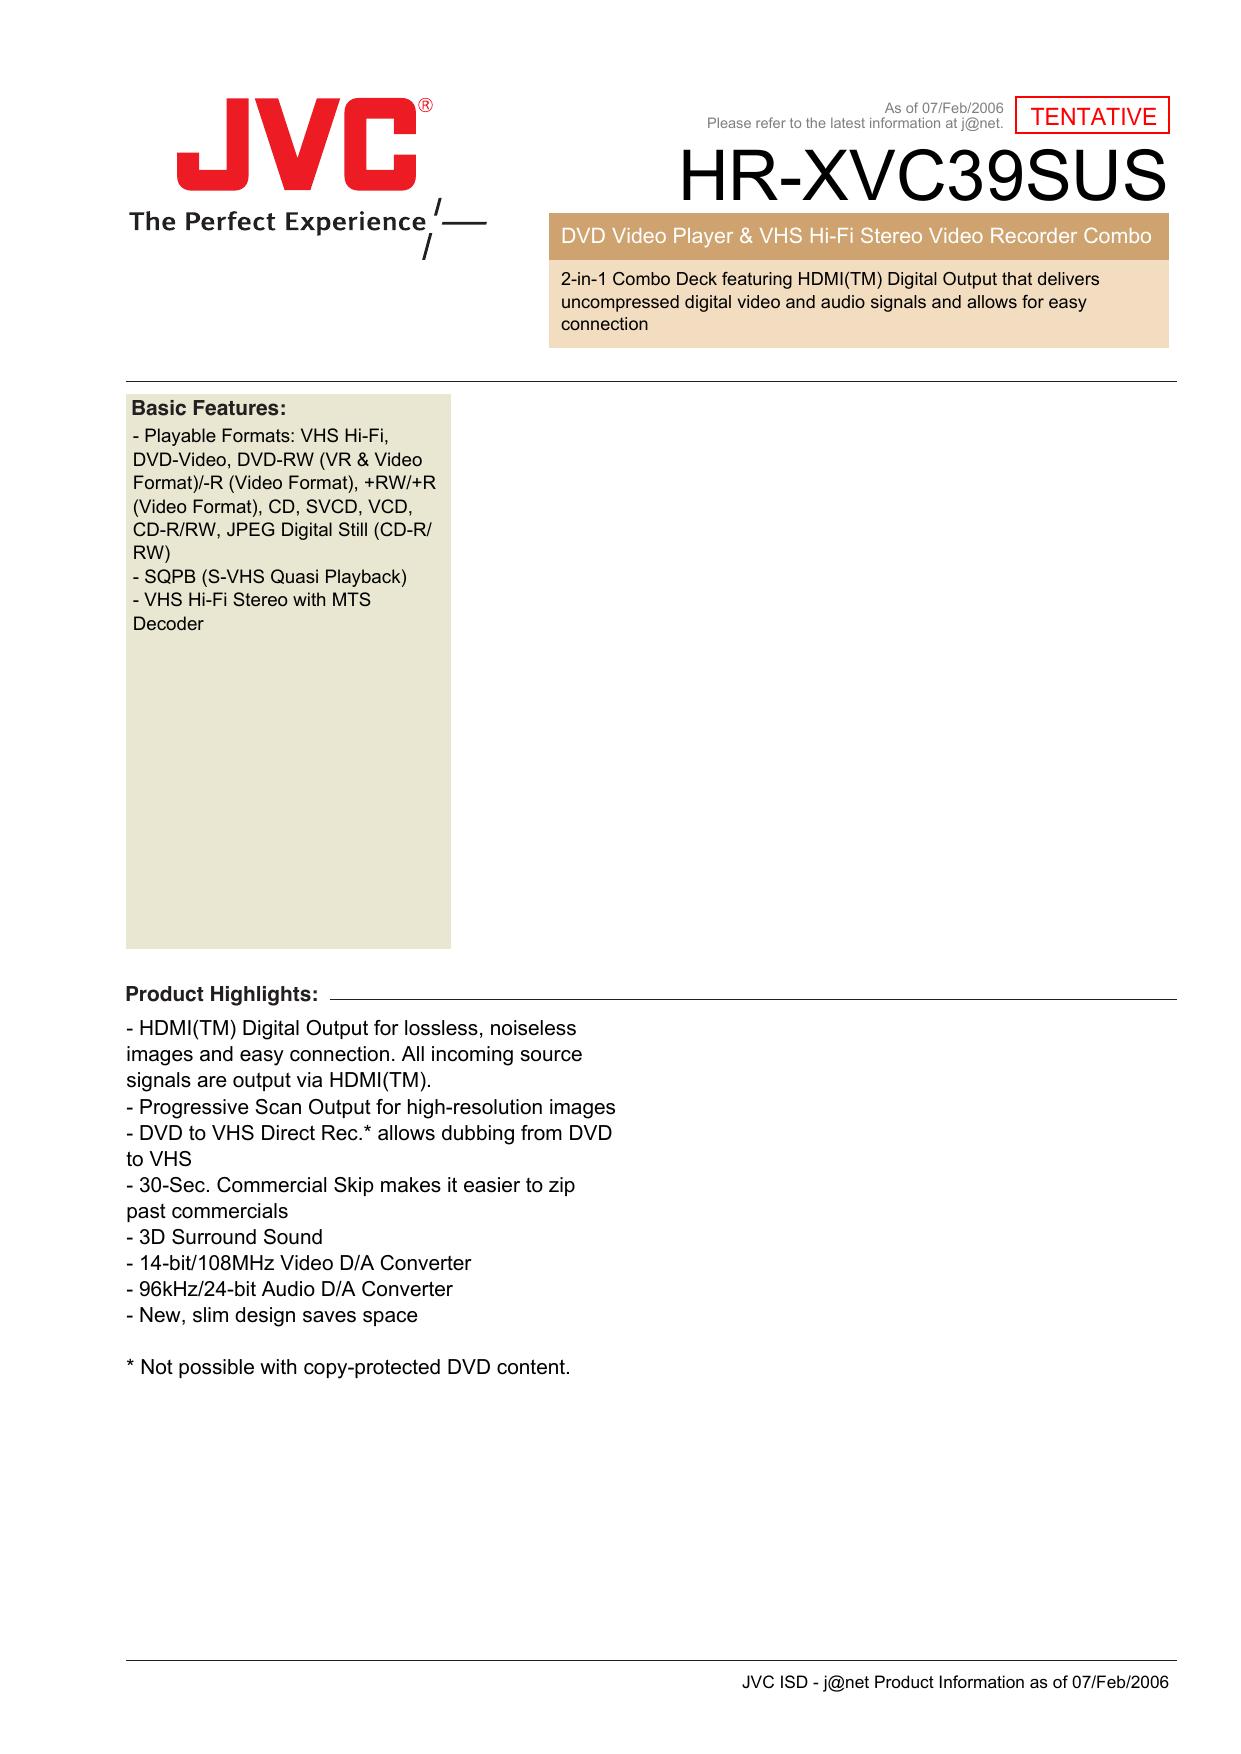 HR-XVC39SUS - PDF Text Files | manualzz com